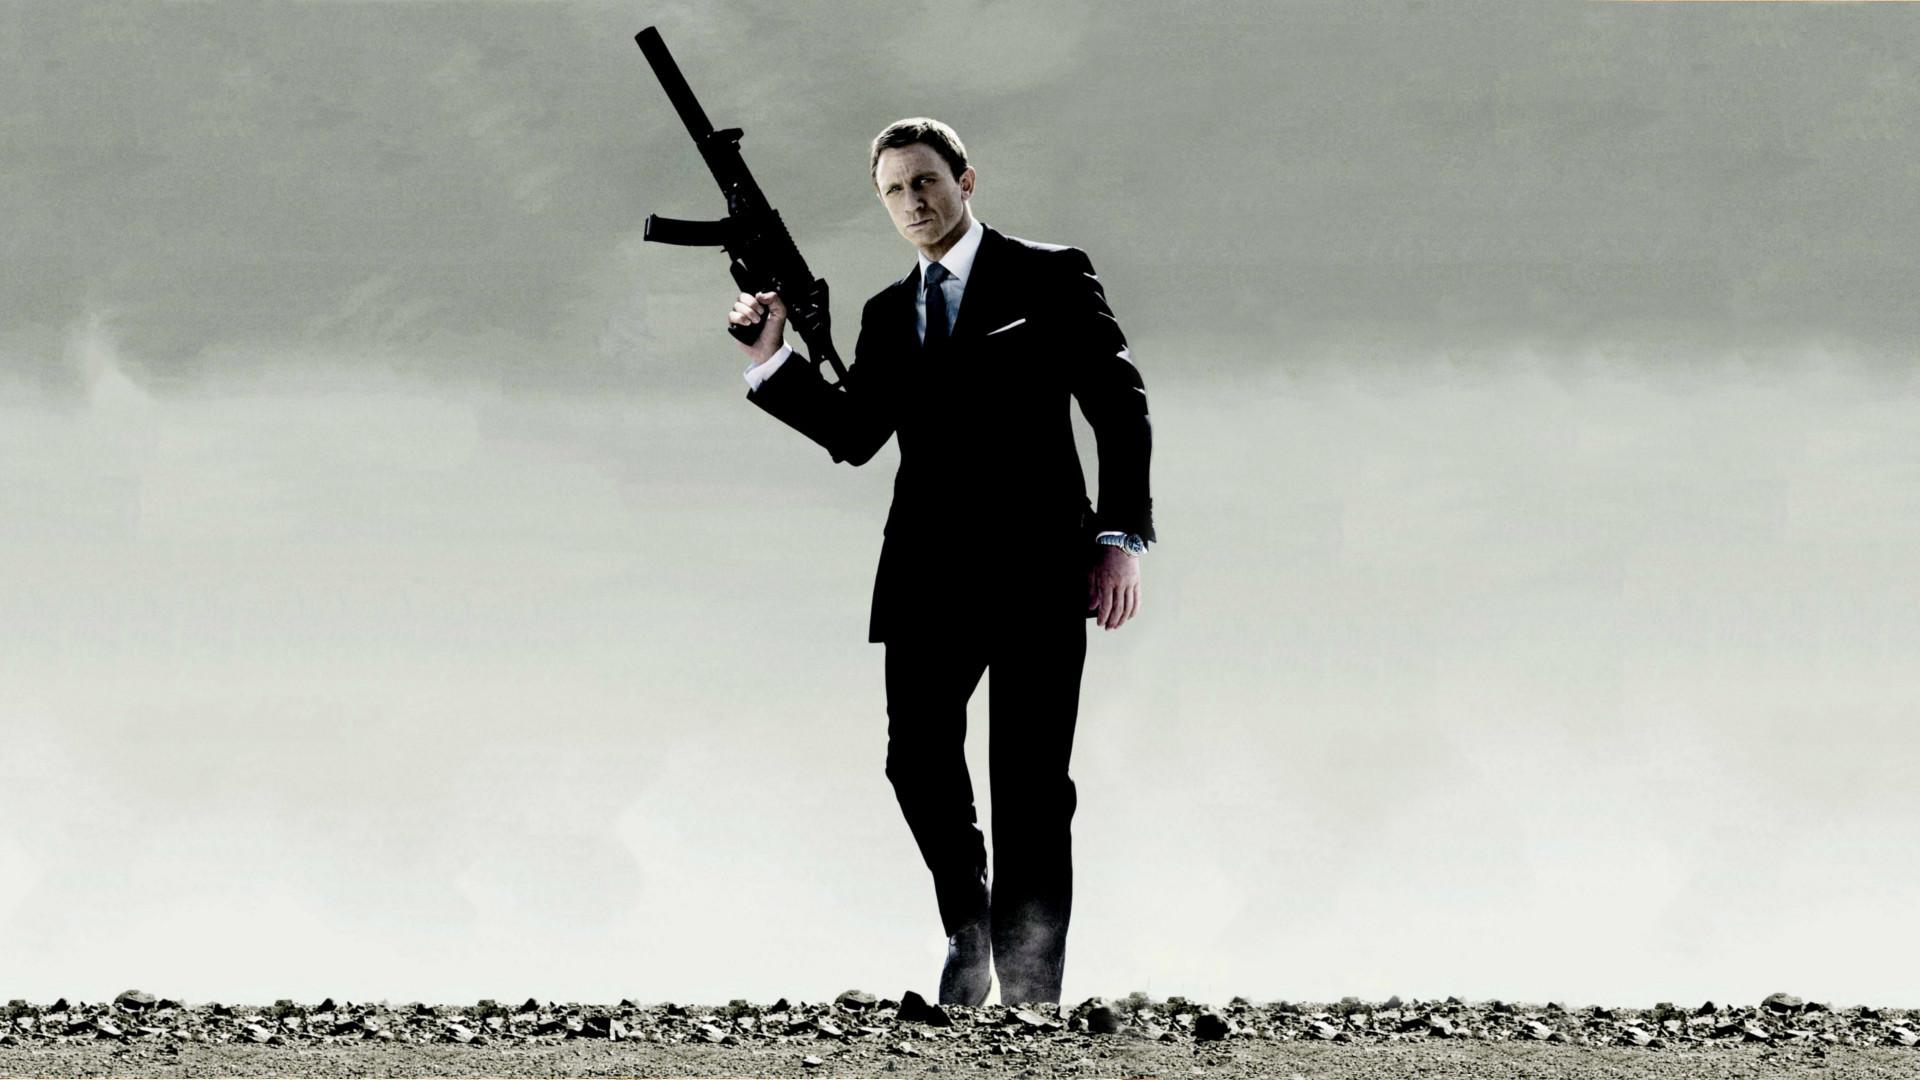 007 background image - Quantum Of Solace 007 James Bond Wallpaper 1920x1080 102443 Wallpaperup